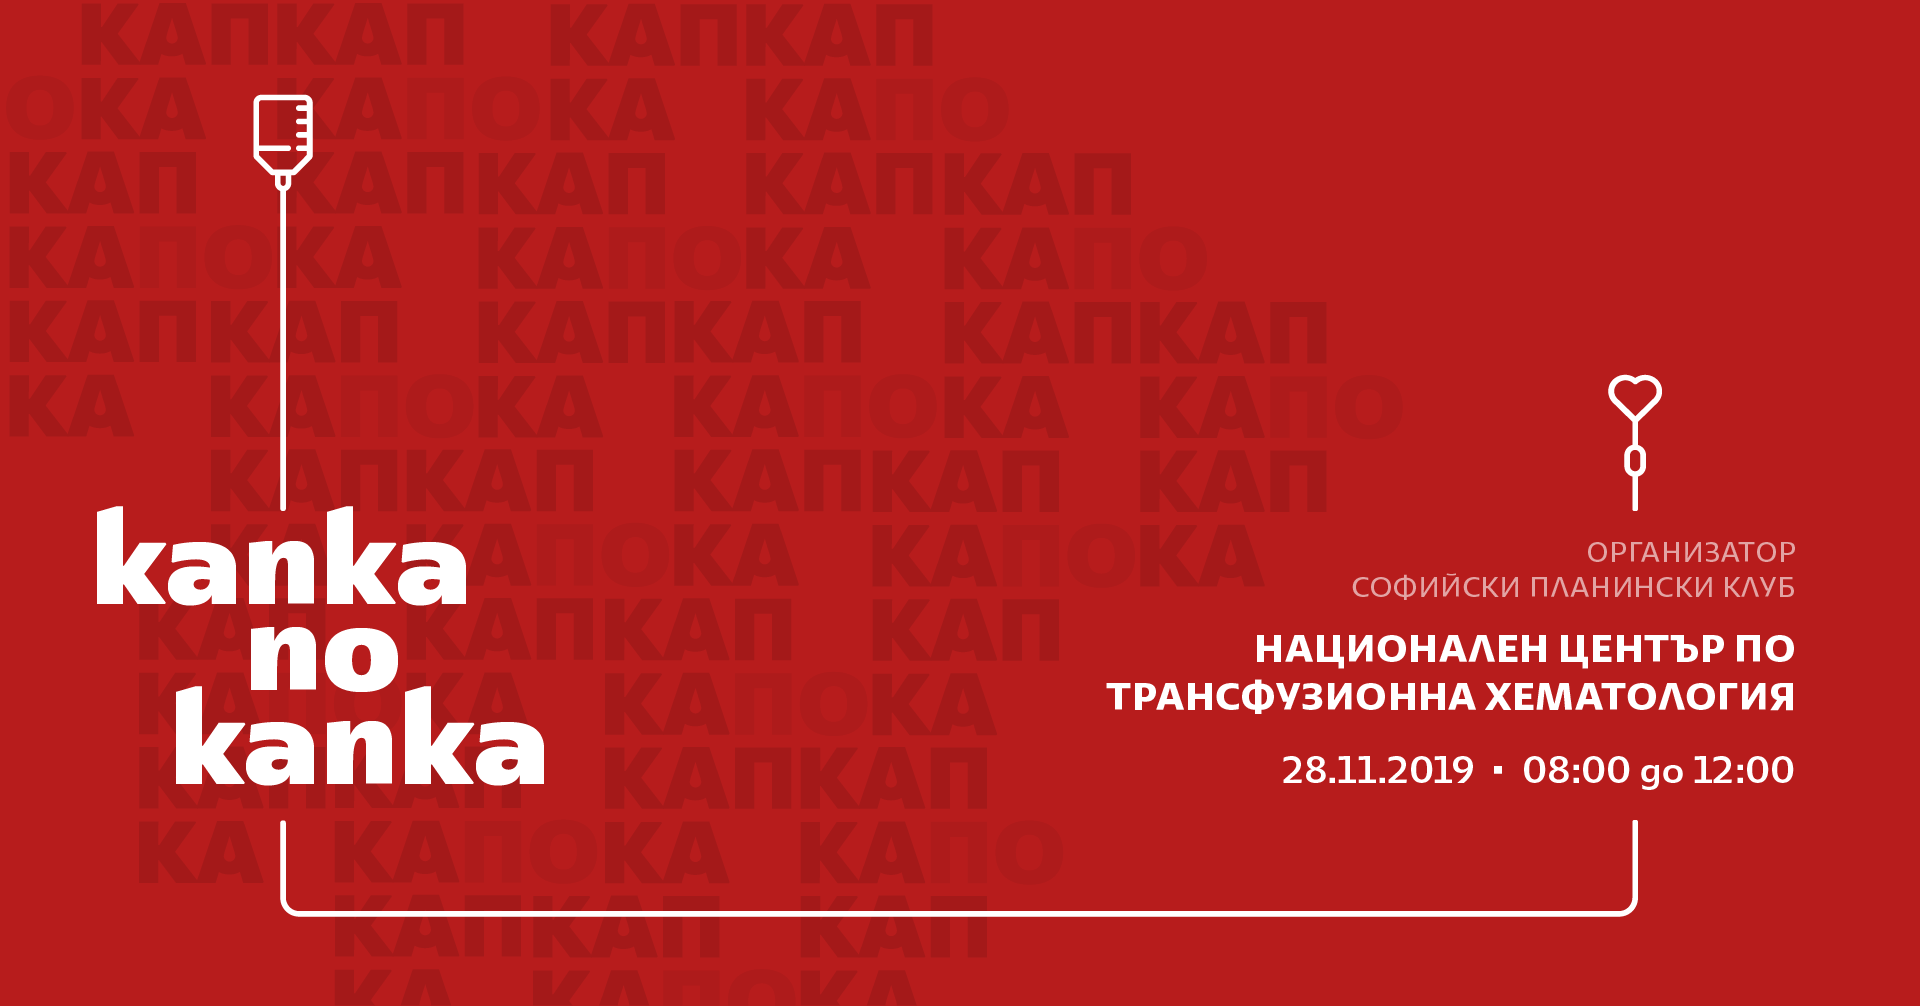 kapka-po-kapka_event-red